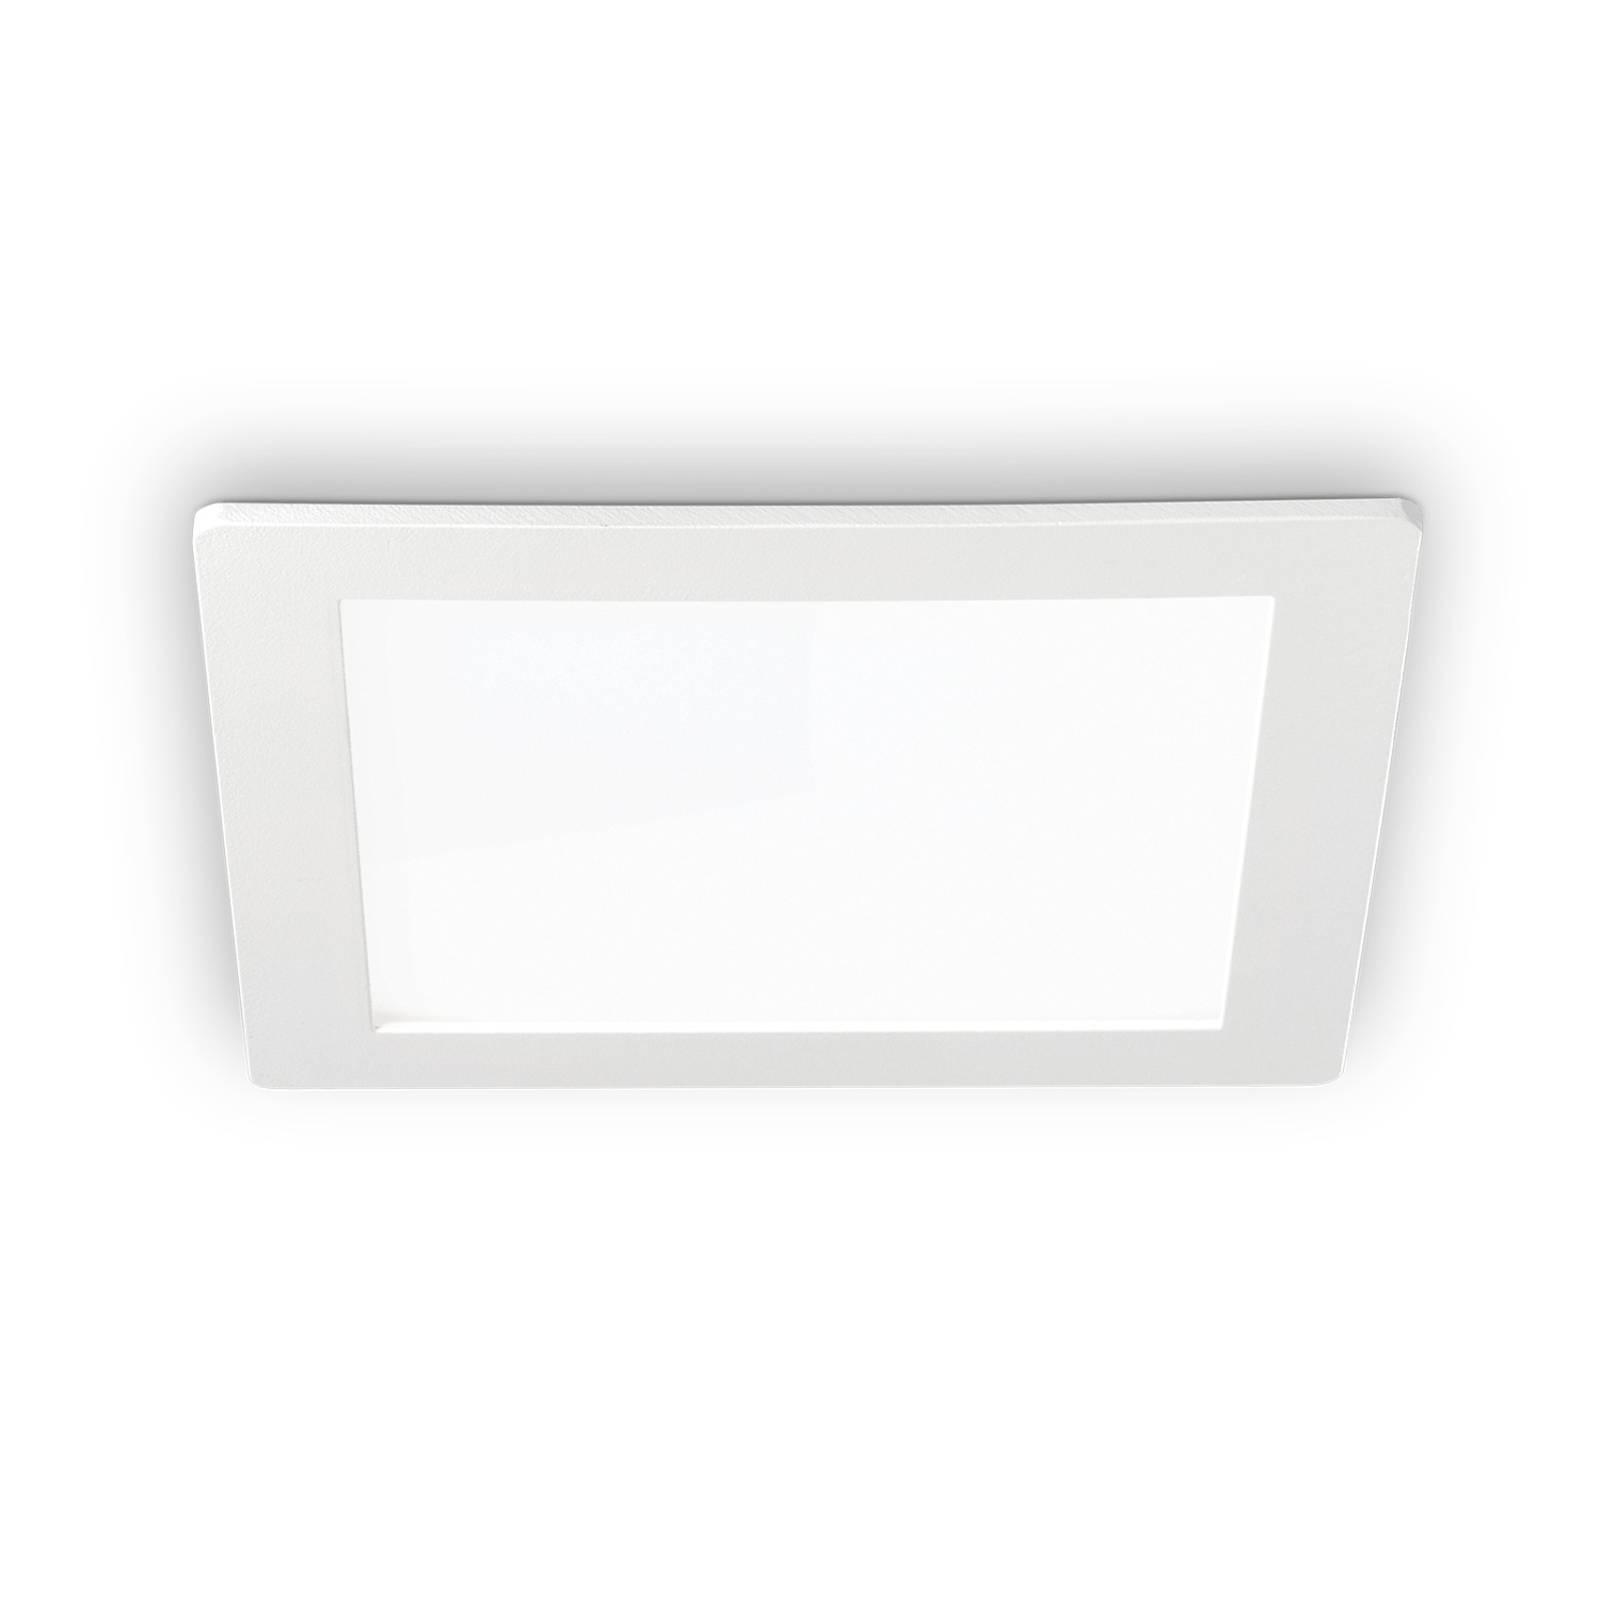 LED-kattouppovalaisin Groove square 16,8 x 16,8 cm